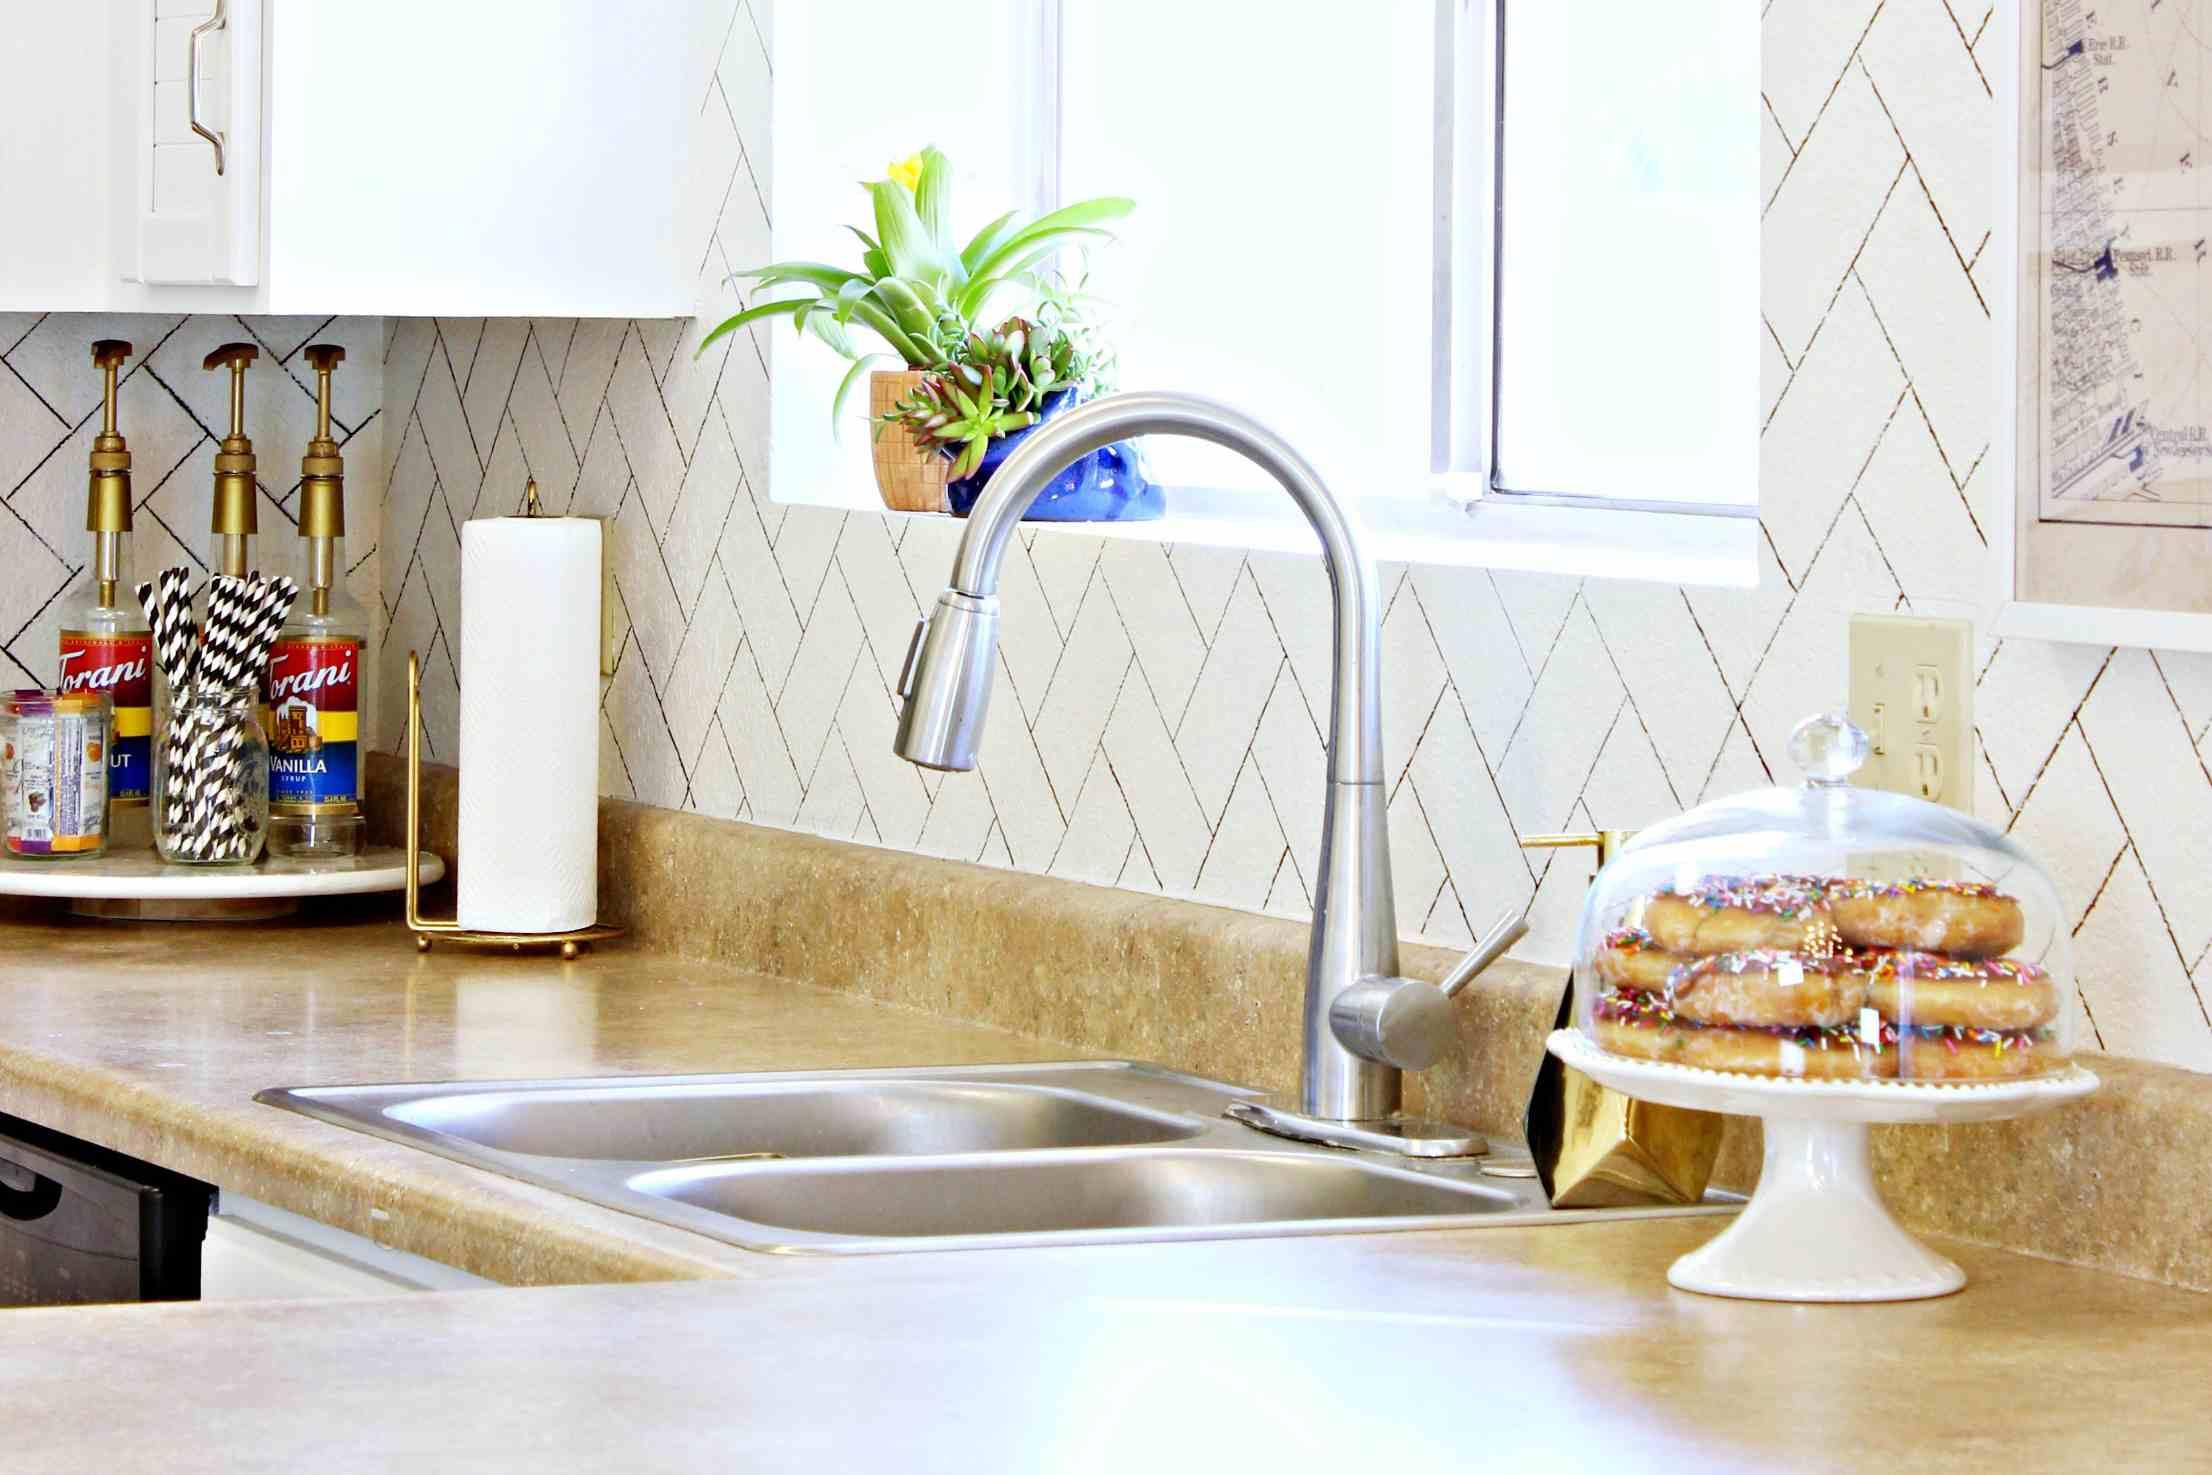 - Free Download 13 Removable Kitchen Backsplash Ideas [2212x1475